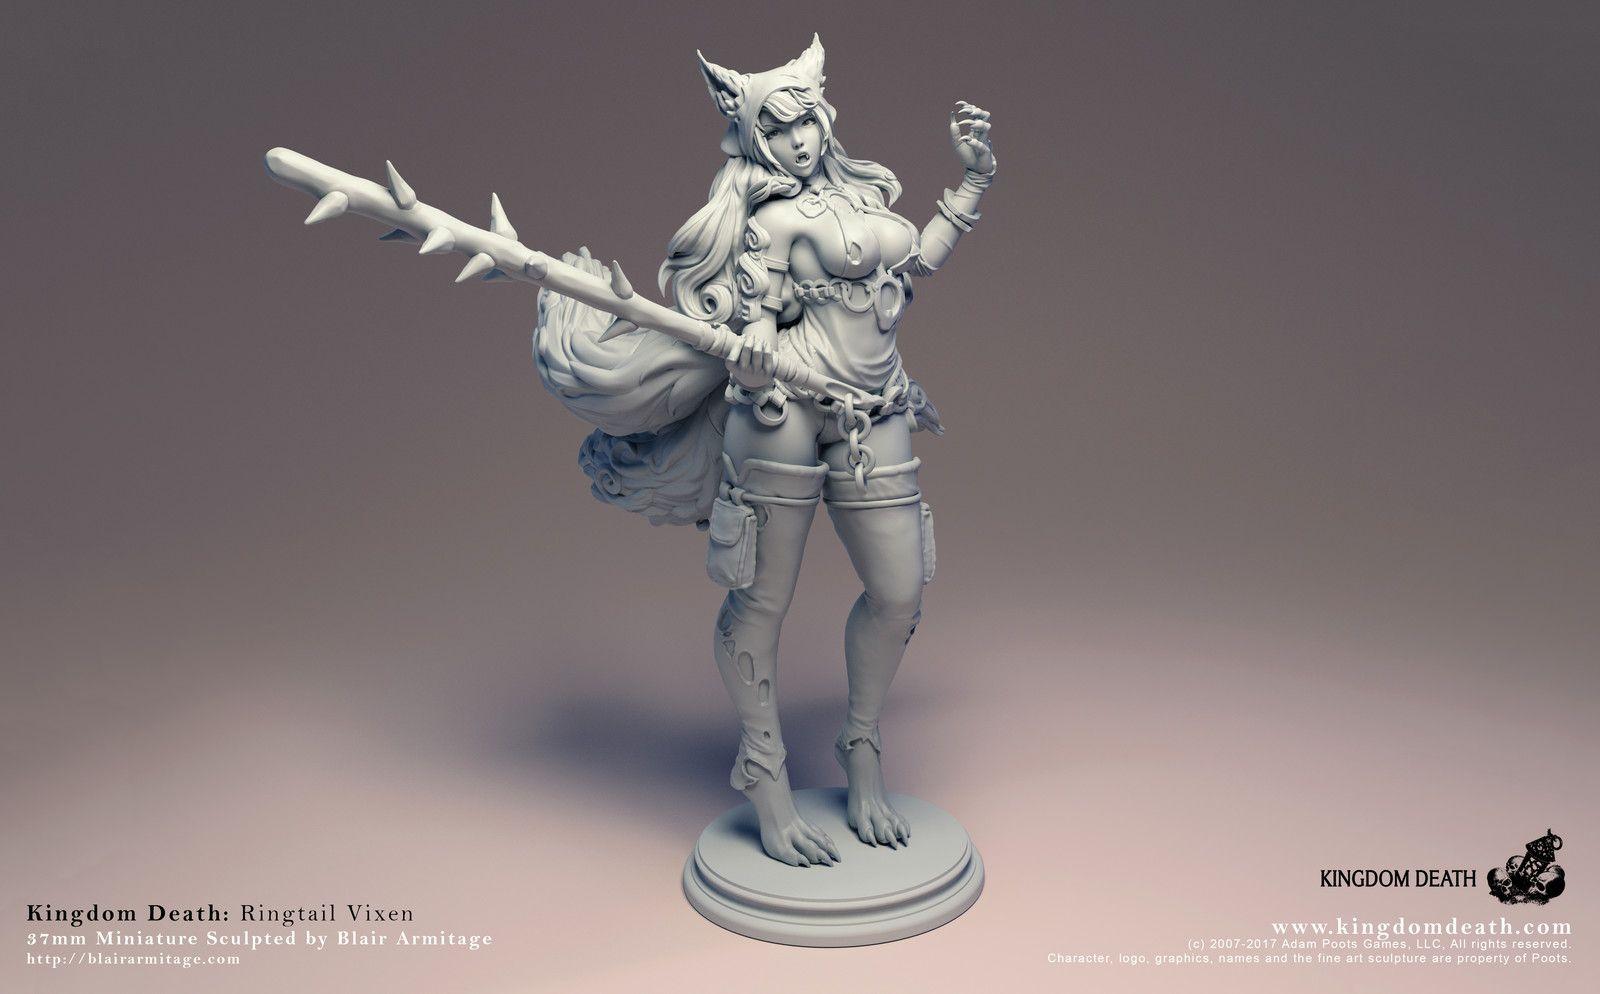 Kingdom Death - Ringtail Vixen, Blair Armitage on ArtStation at https://www.artstation.com/artwork/ymYox